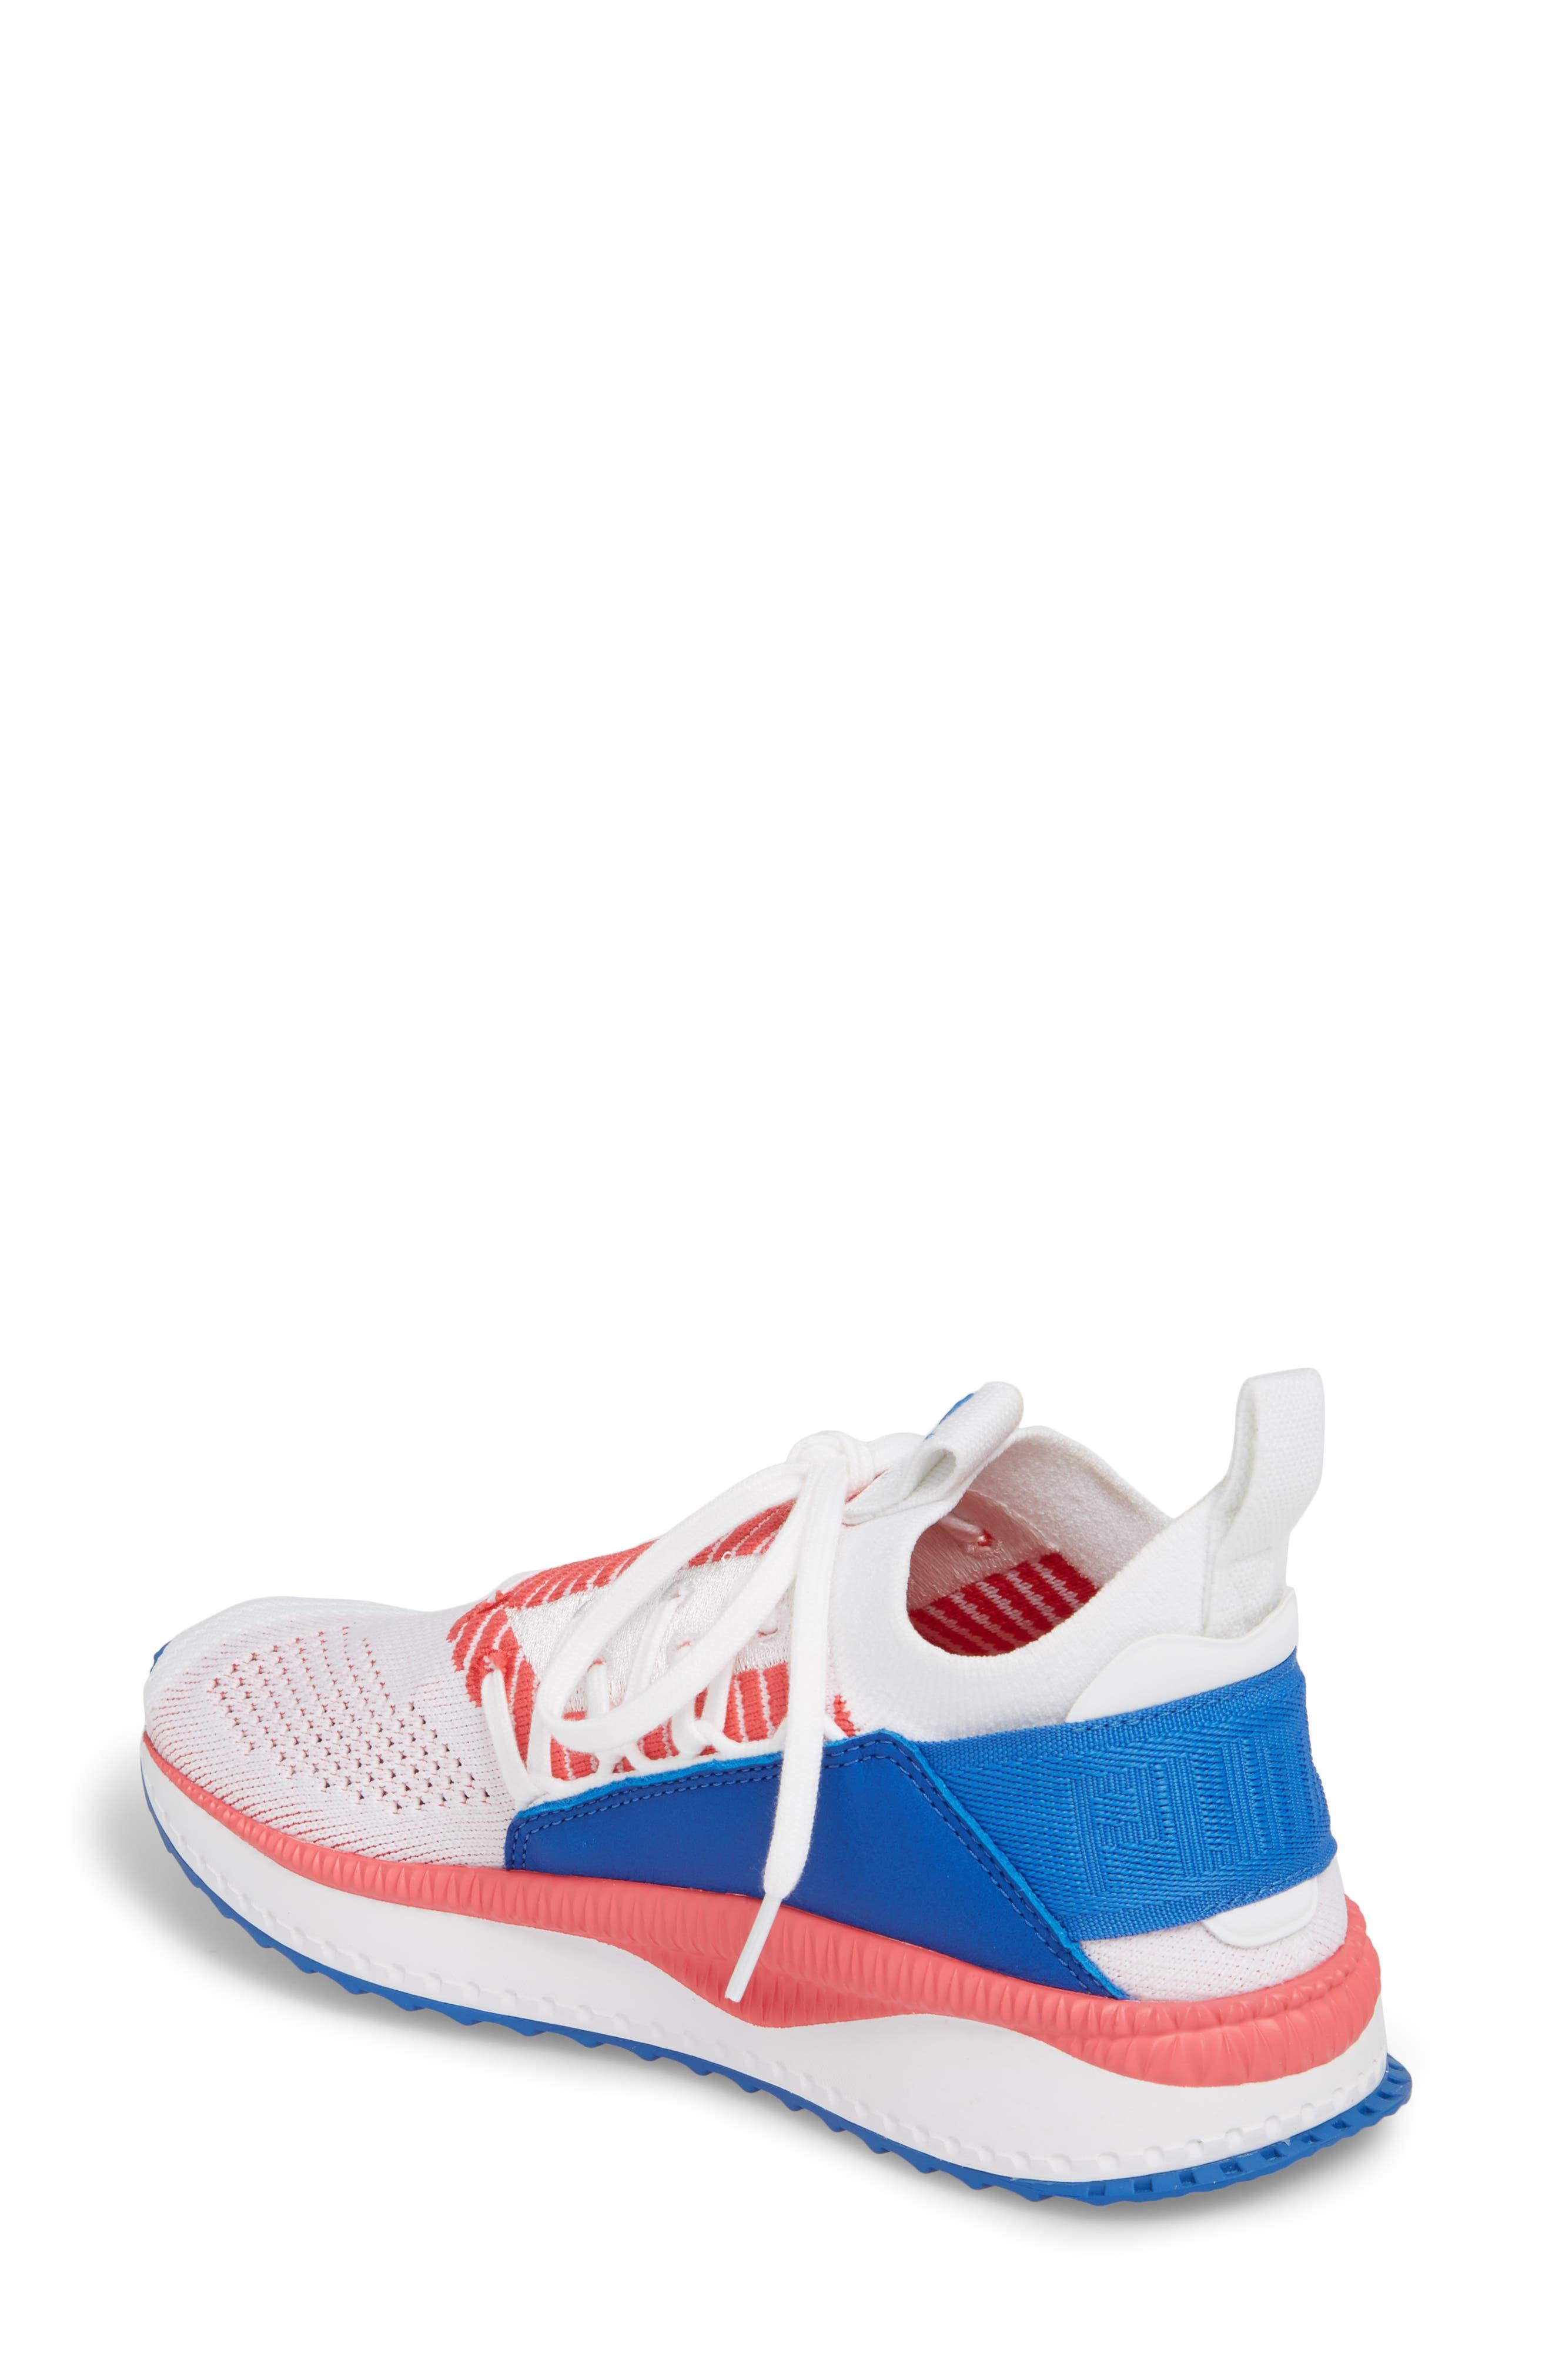 Tsugi Jun Knit Sneaker,                             Alternate thumbnail 13, color,